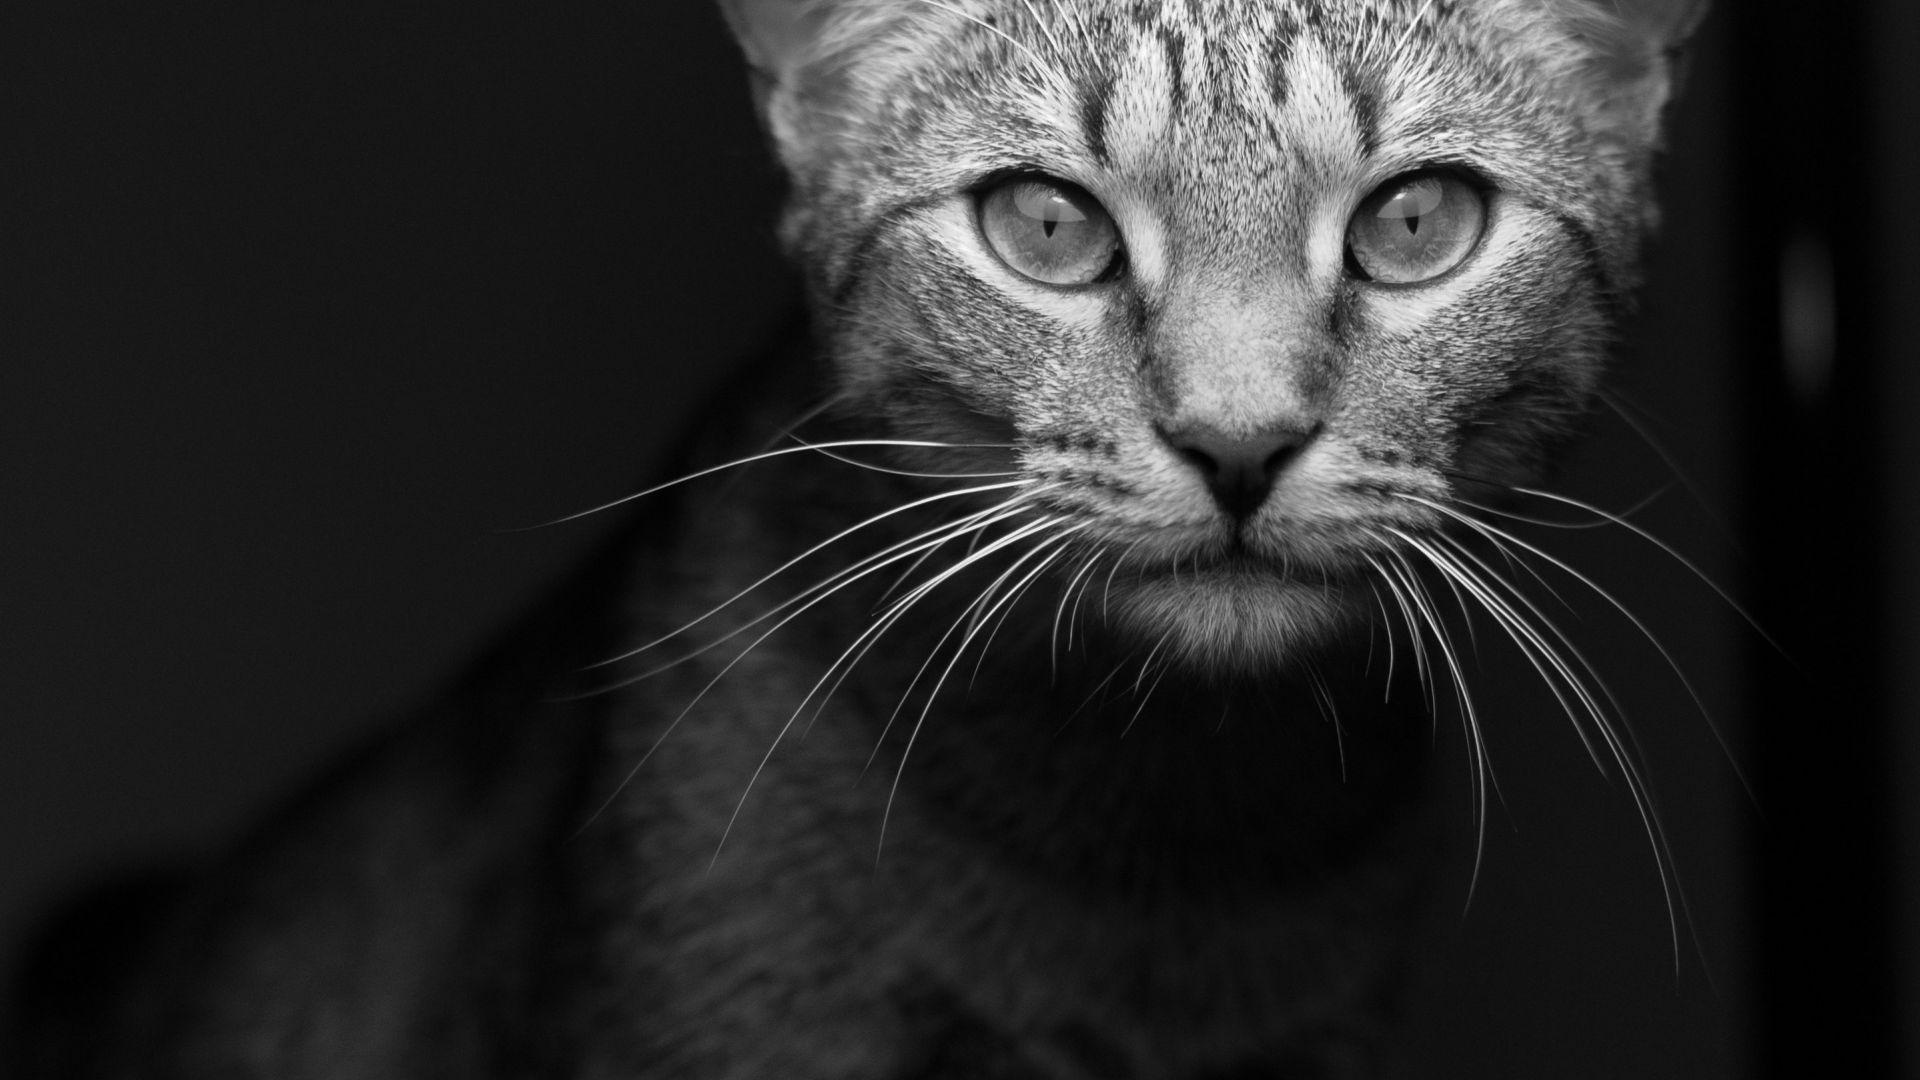 Wallpaper Cat animal muzzle, monochrome